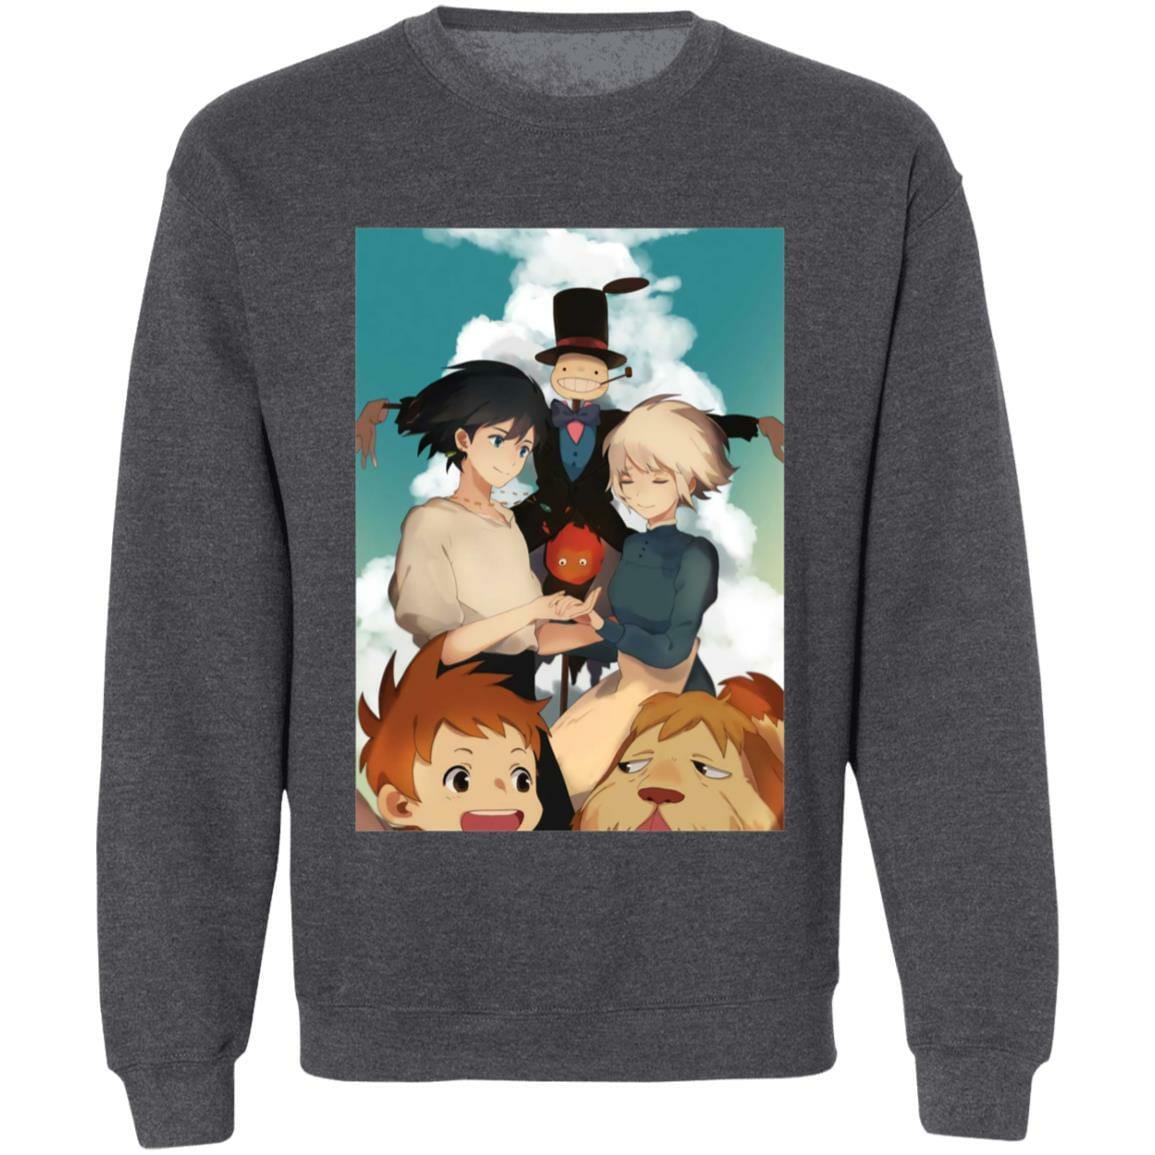 Howl's Moving Castle – Happy Ending Sweatshirt